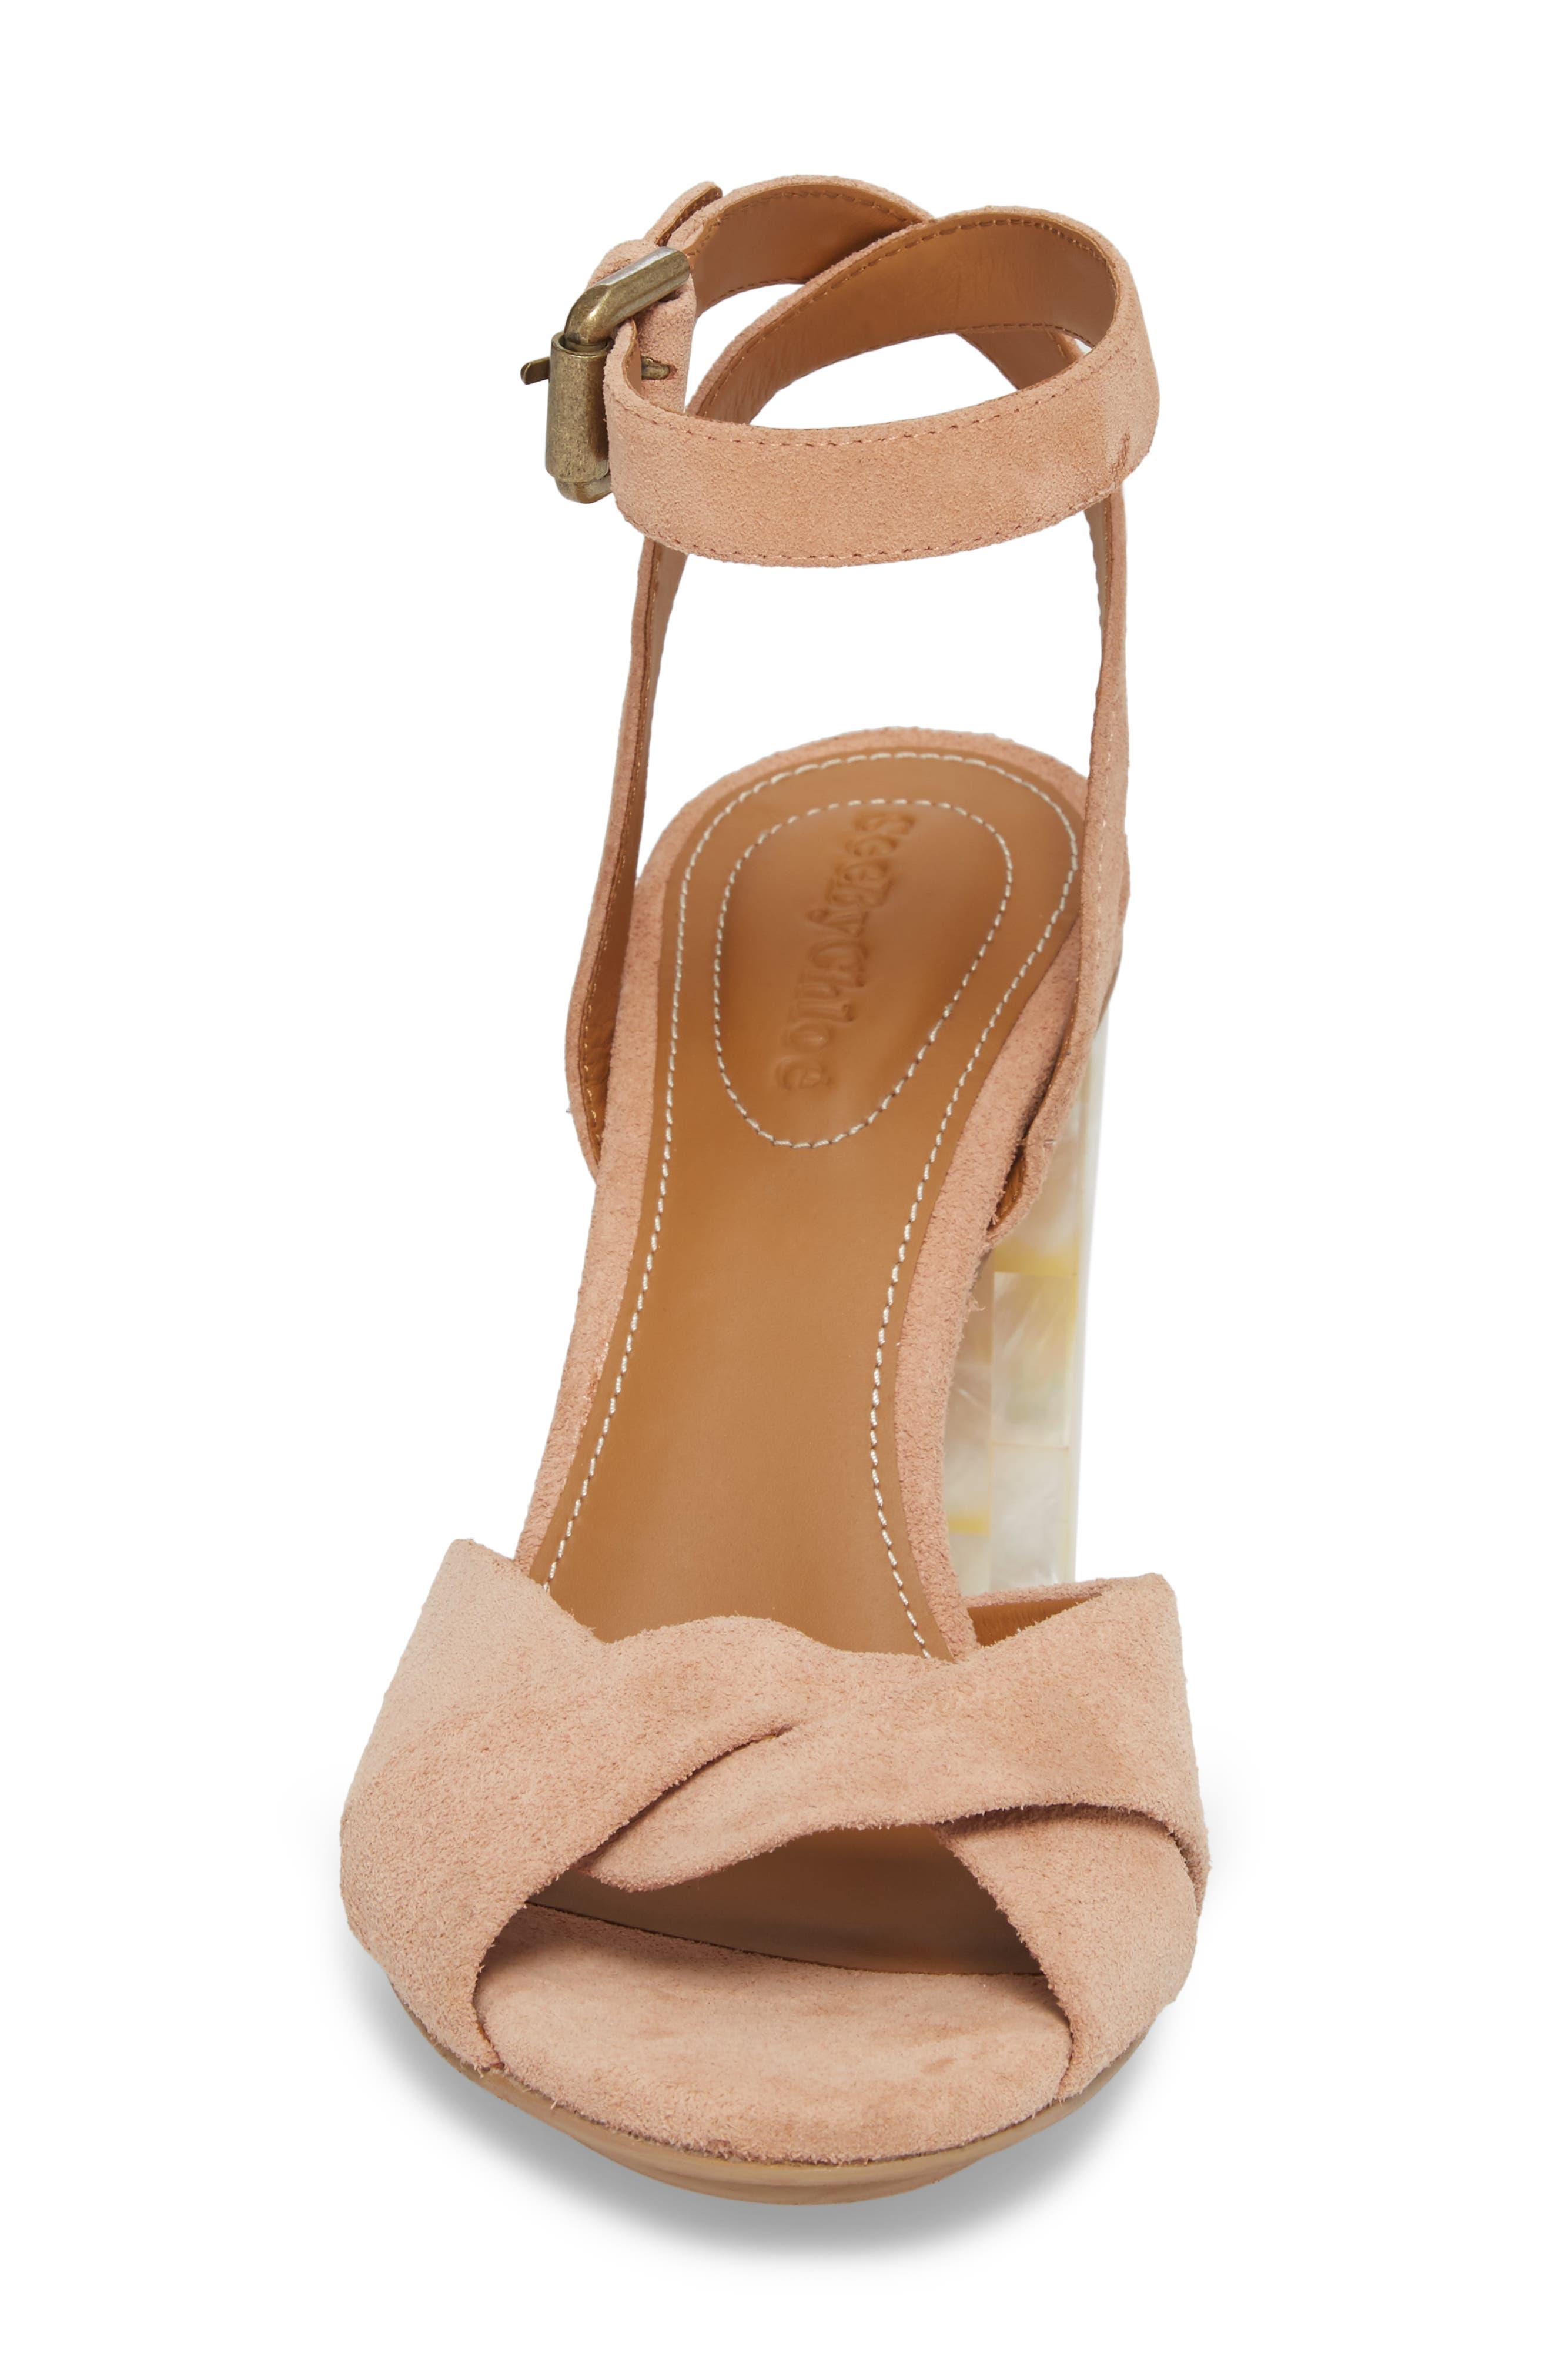 Isida Block Heel Sandal,                             Alternate thumbnail 4, color,                             Cipria